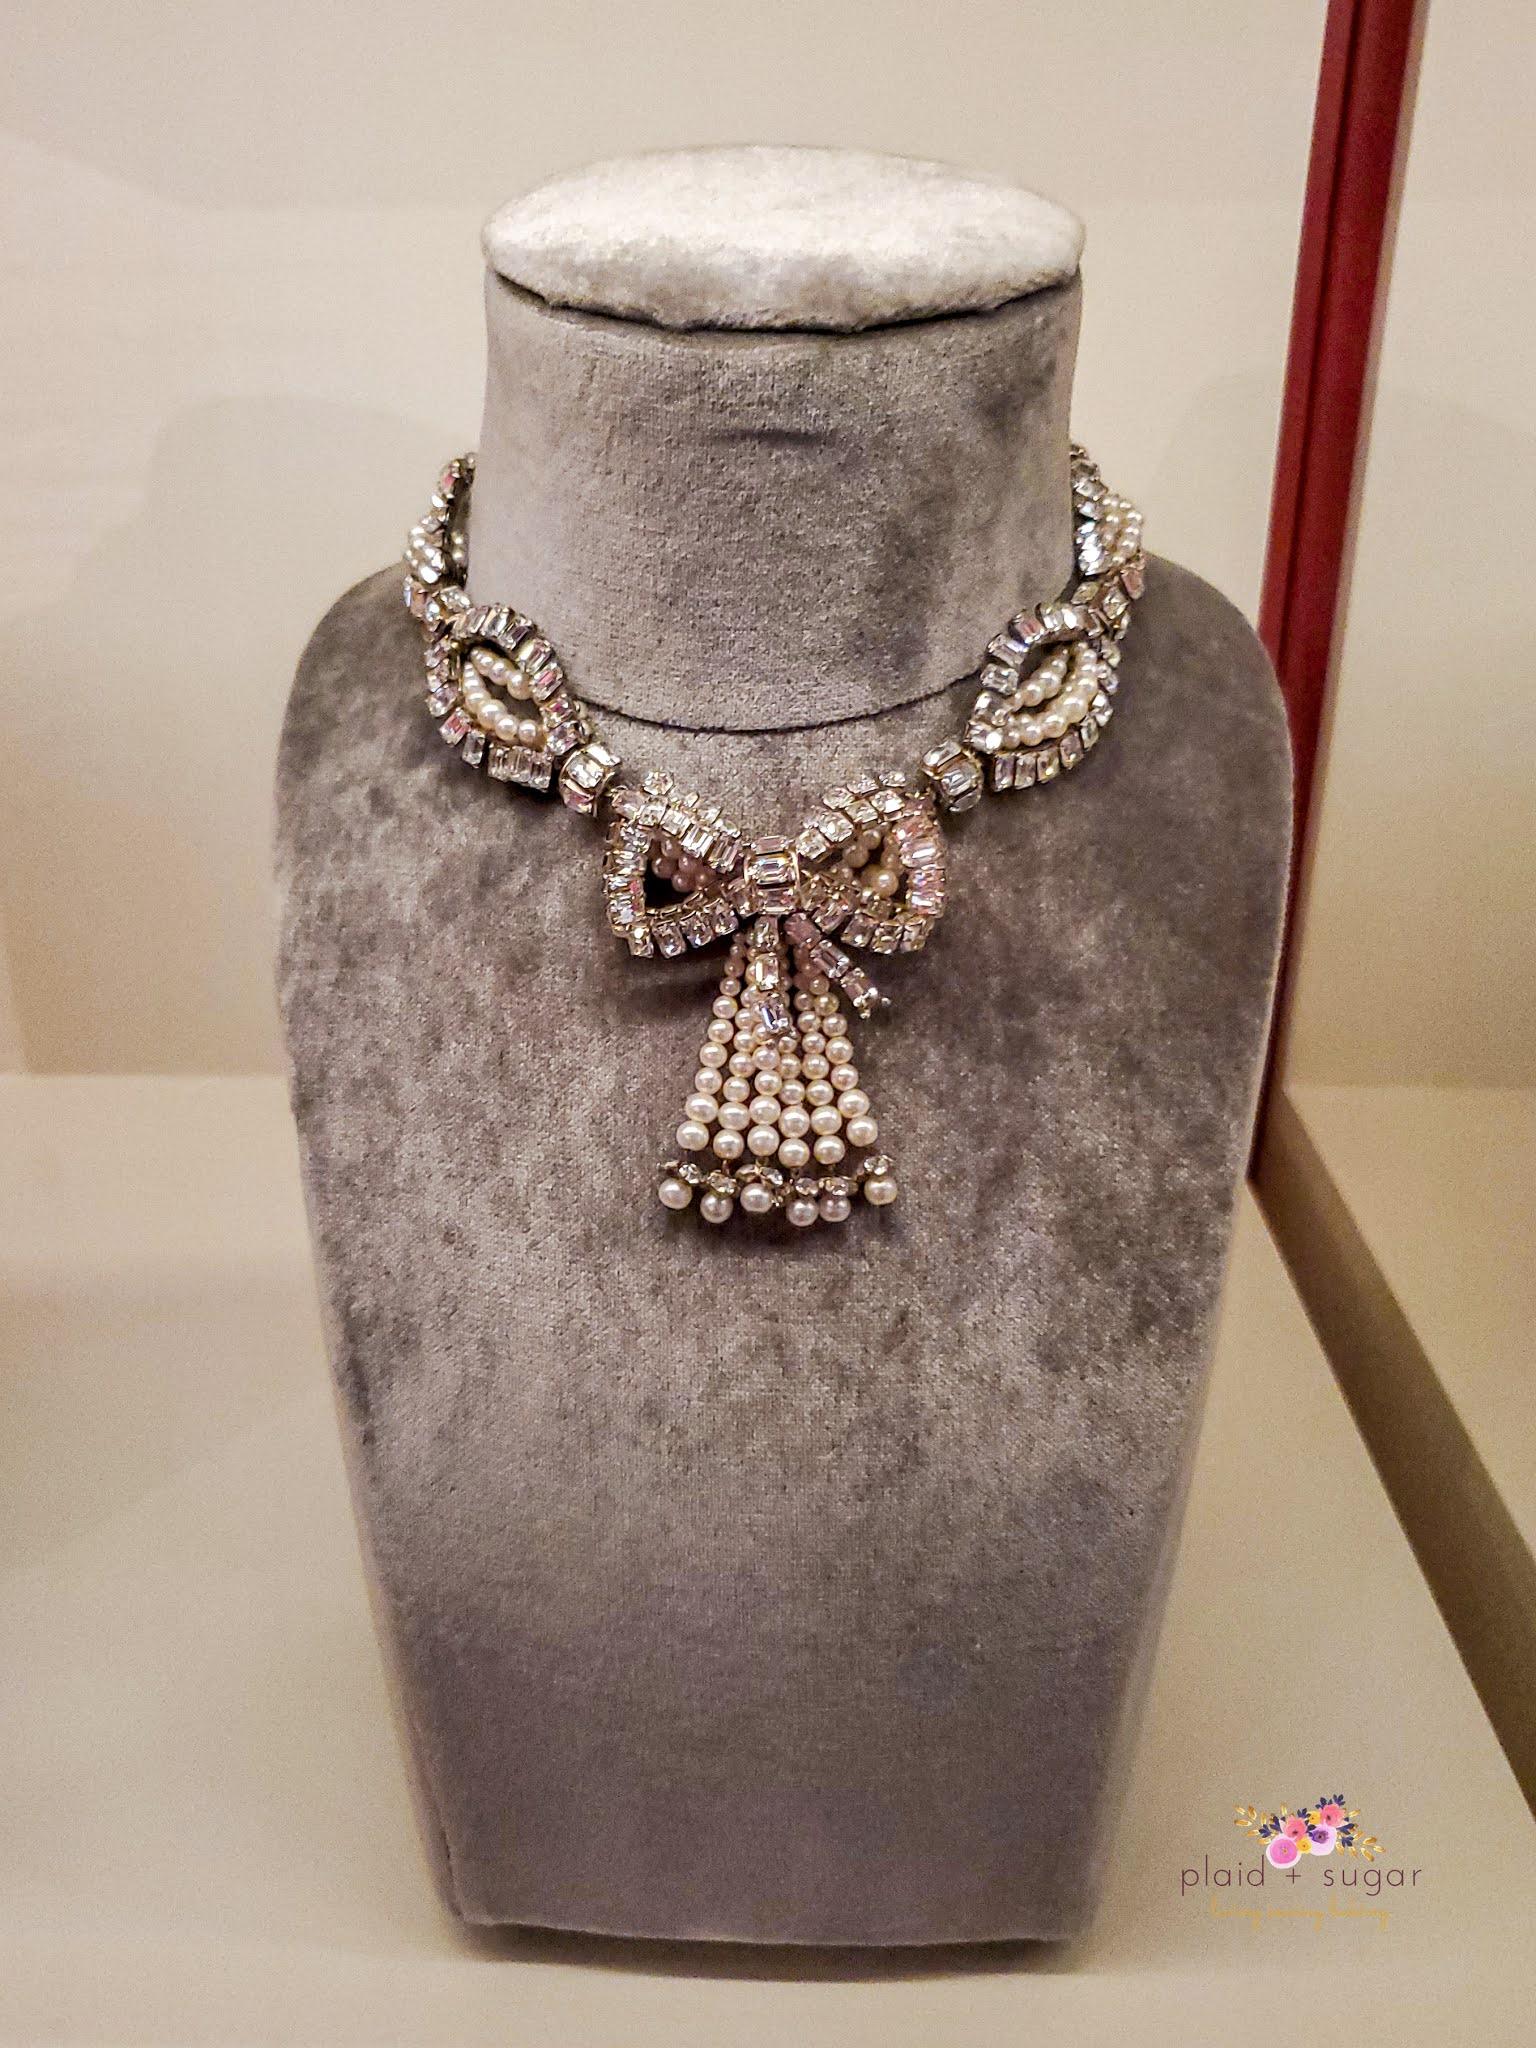 Dior Diamond bow chocker exhibited the McCord Museum